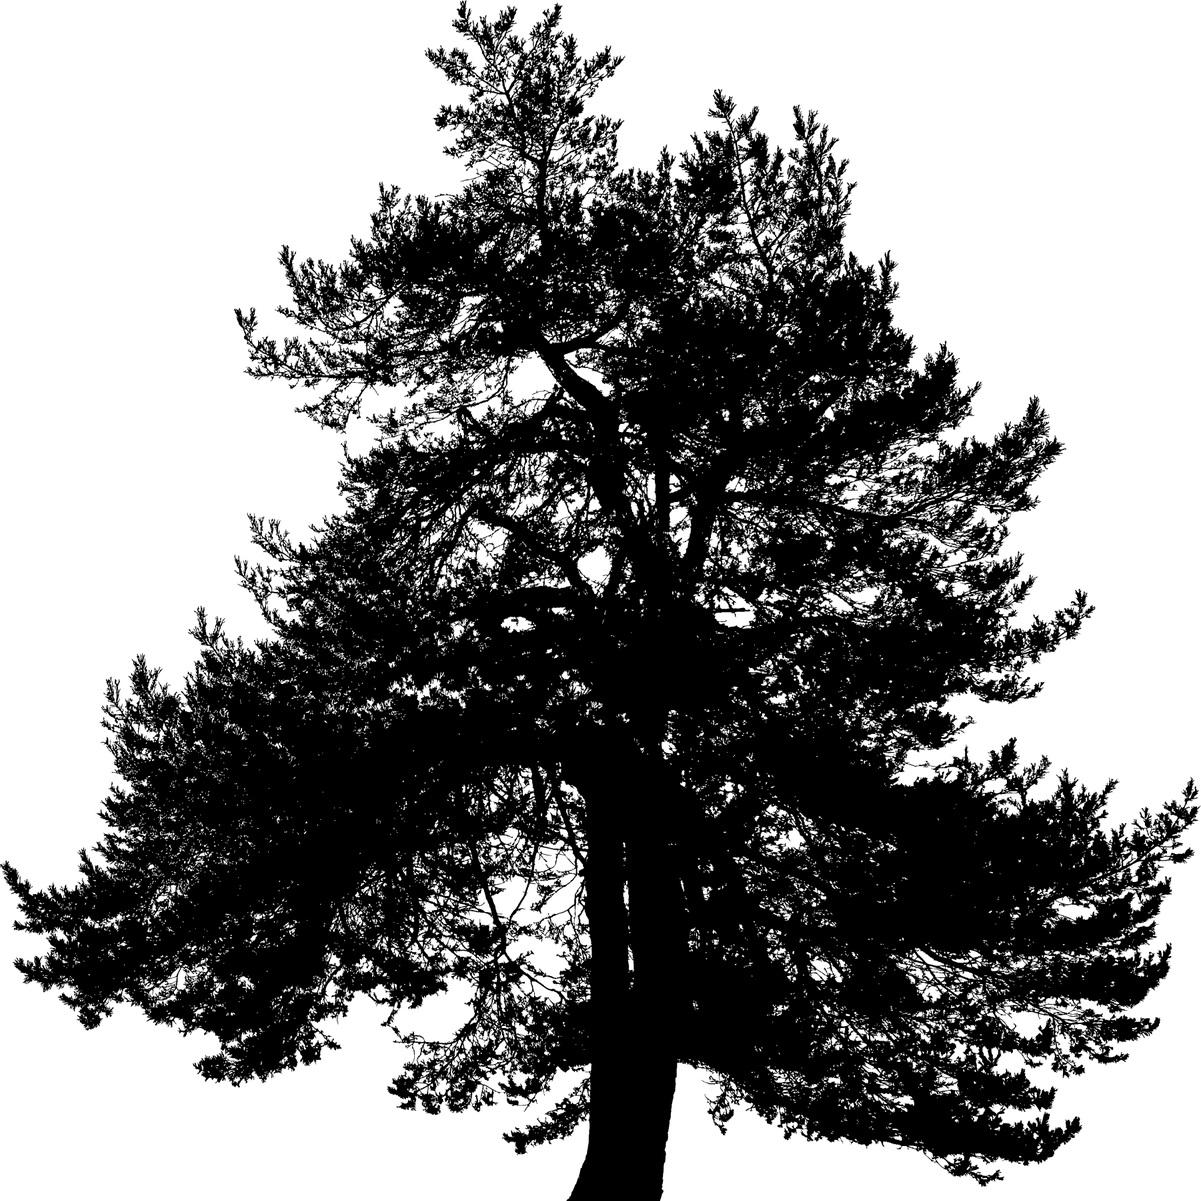 tree-4179484_1280.jpg